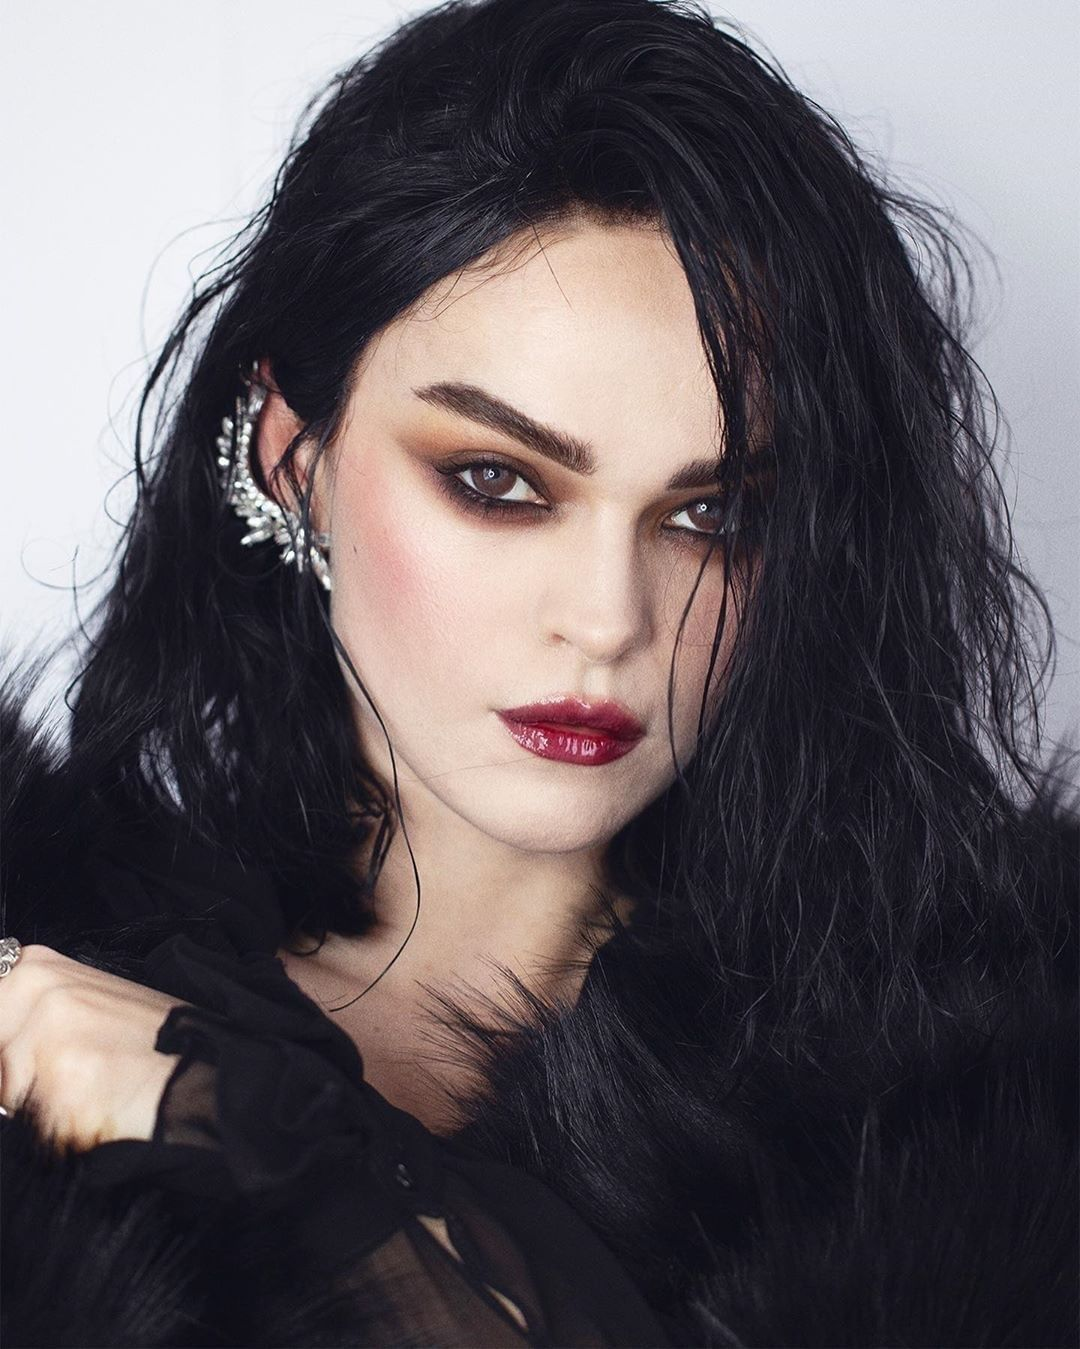 Ttdeye Queen Chocolate Colored Contact Lenses In 2020 Black Hair Pale Skin Makeup Hair Pale Skin Pale Skin Dark Hair Makeup